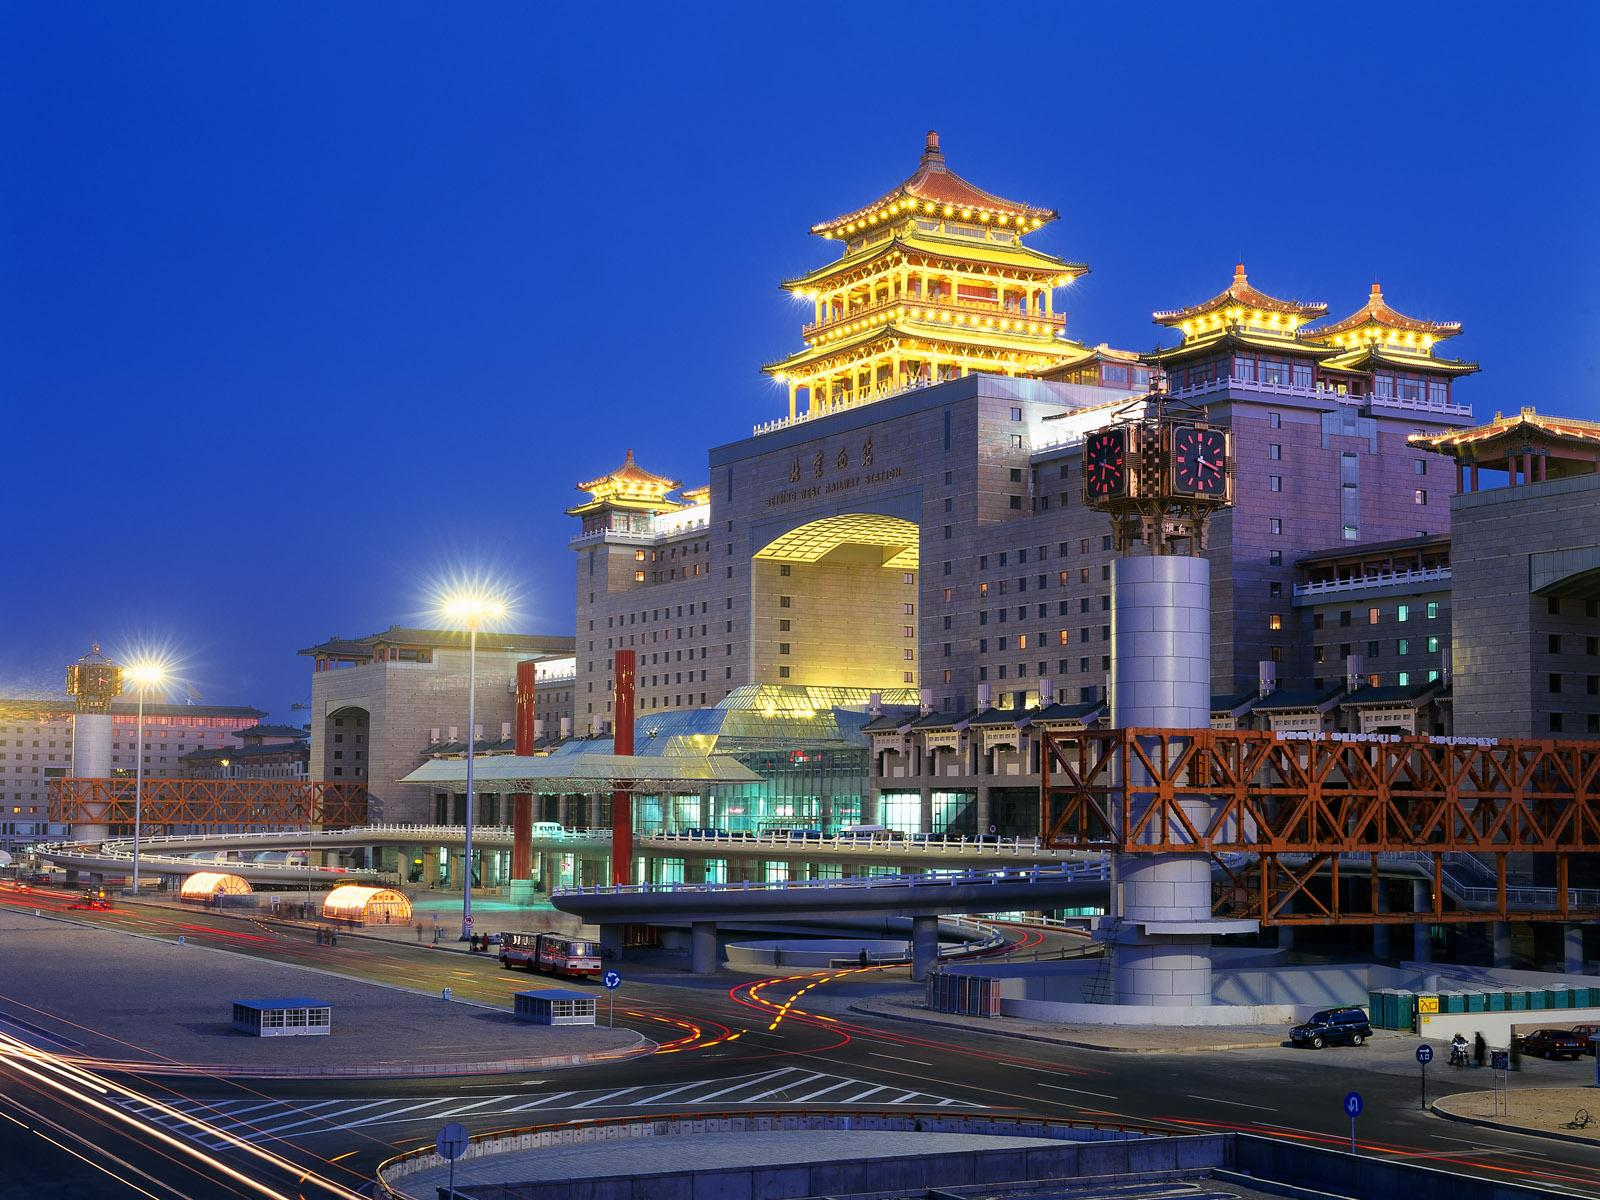 http://1.bp.blogspot.com/-CslBJsjsdIs/UHjhZ-XVxnI/AAAAAAAAAc8/UDPE6N_RRq8/s1600/Beijing-2.jpg